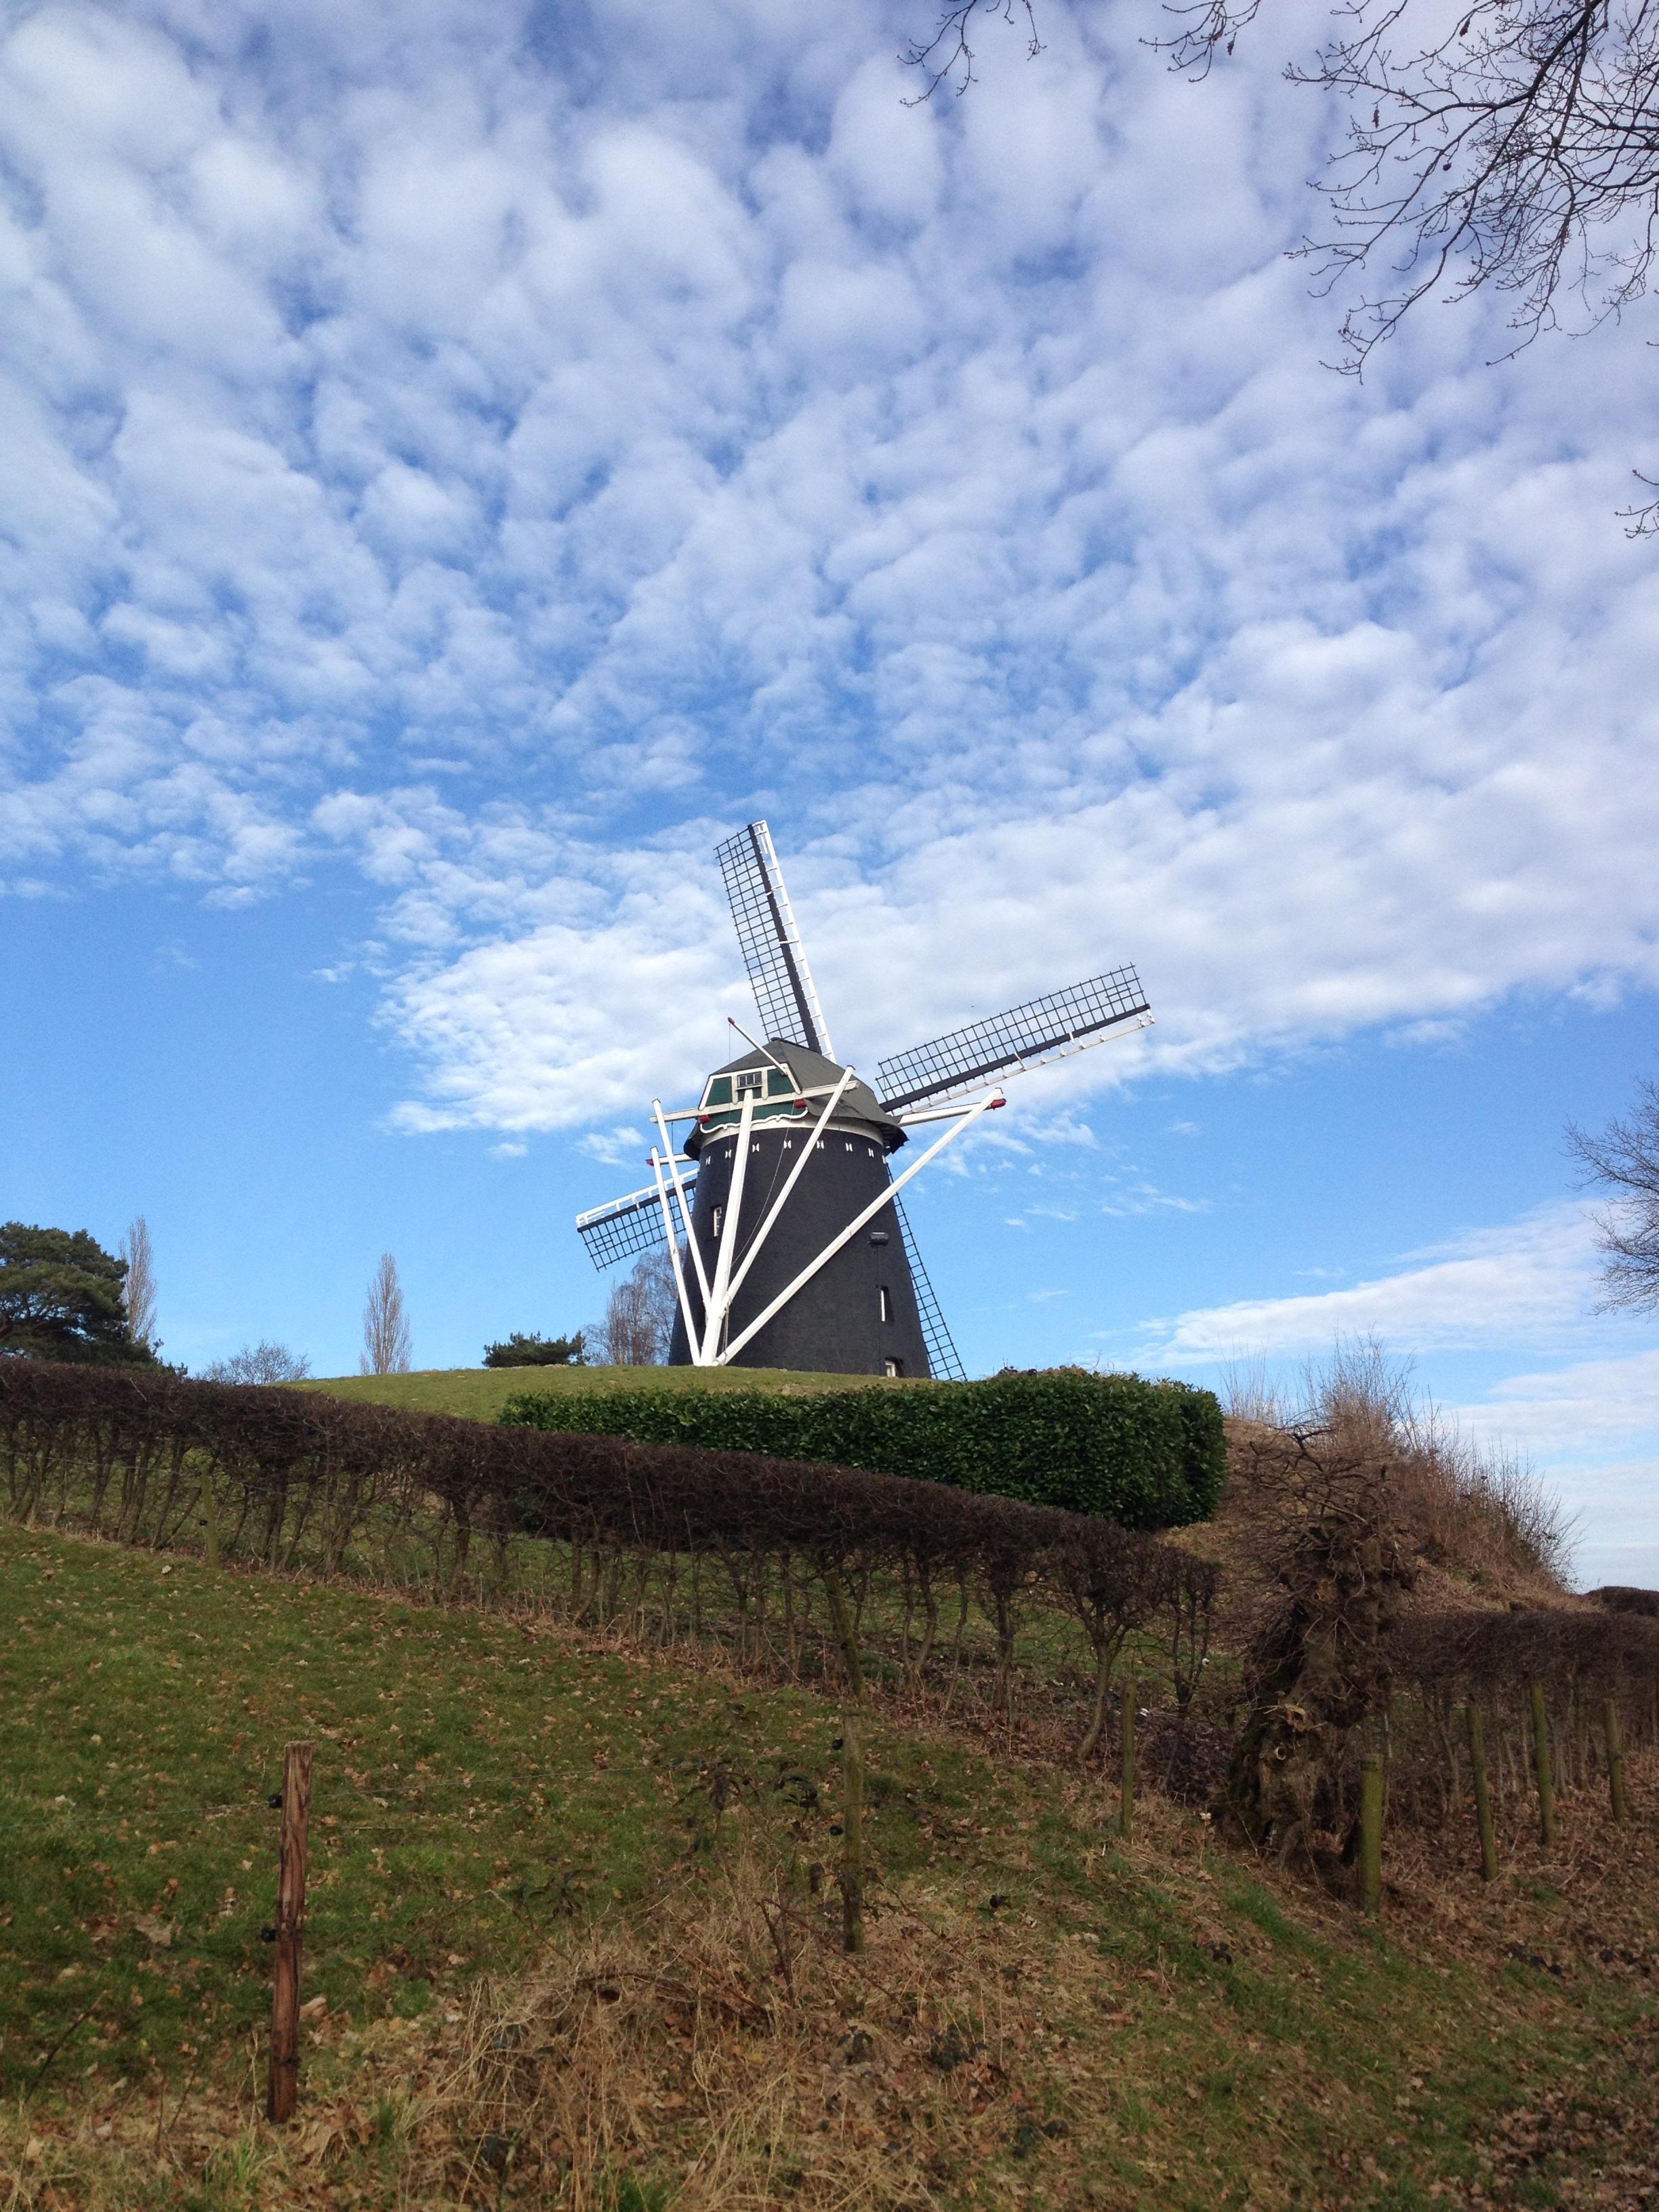 free images landscape sky field prairie windmill wind